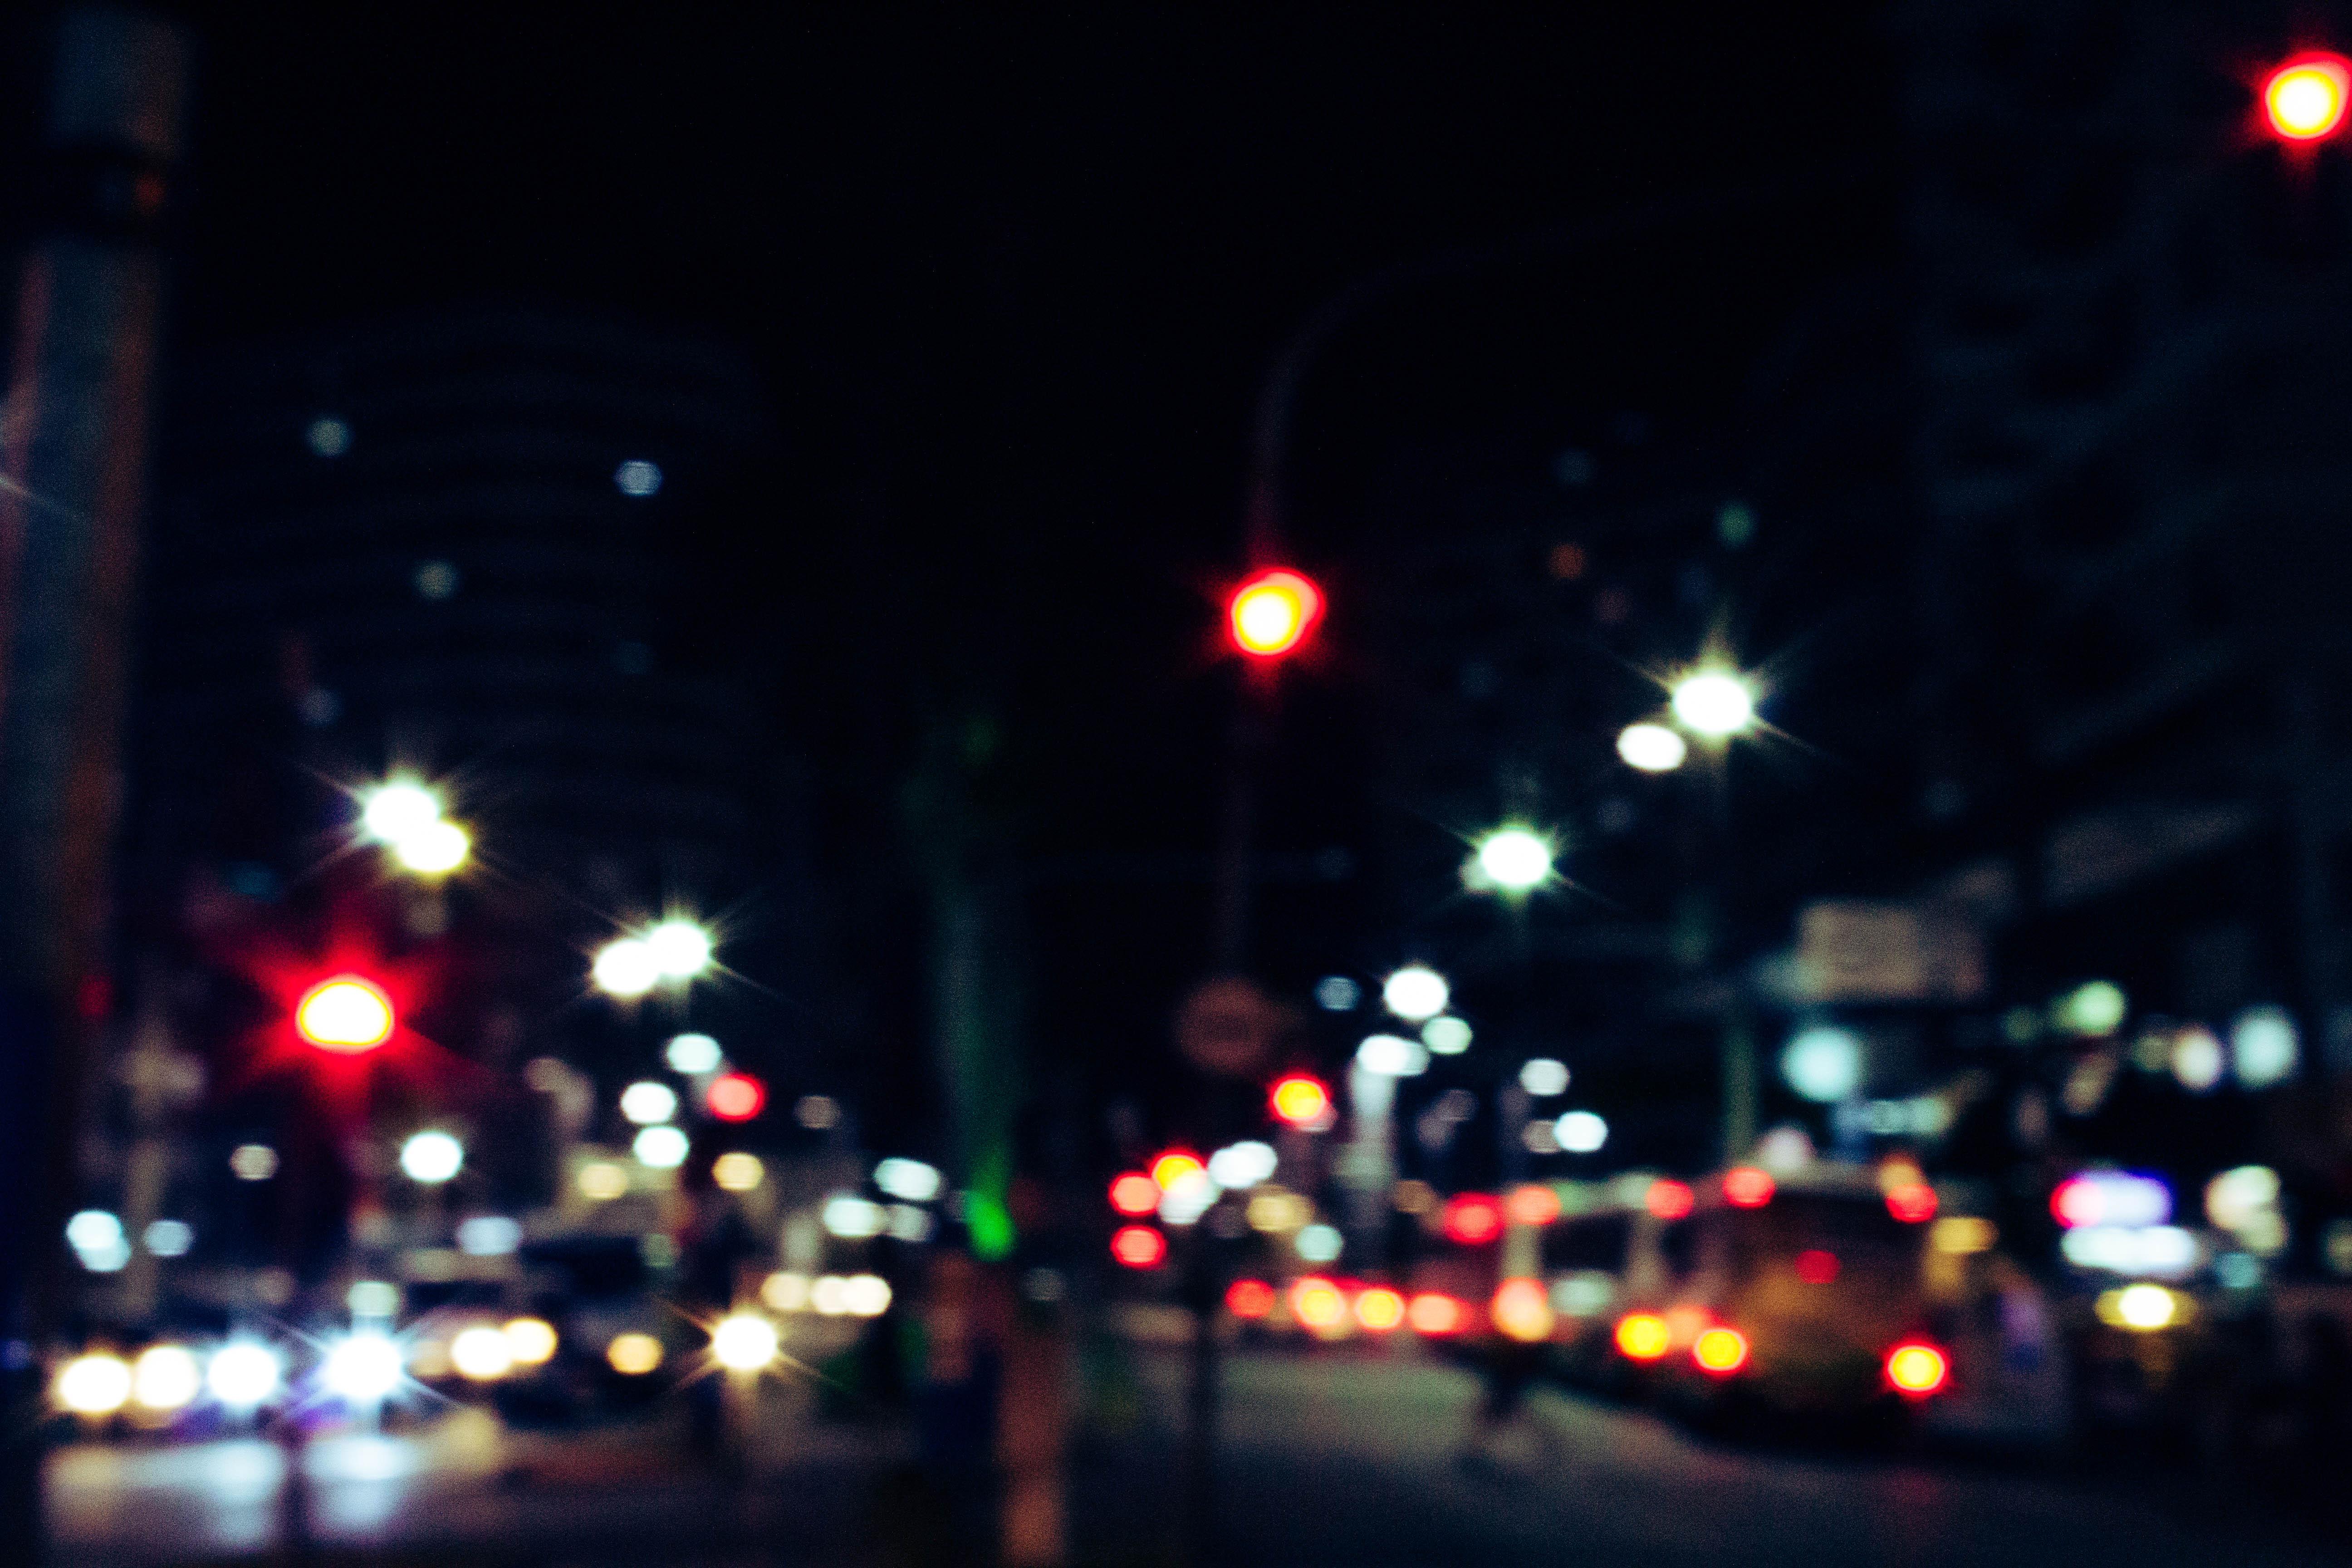 Bokeh Photography Of Street Full Of Vehicles At Night Free Stock Photo